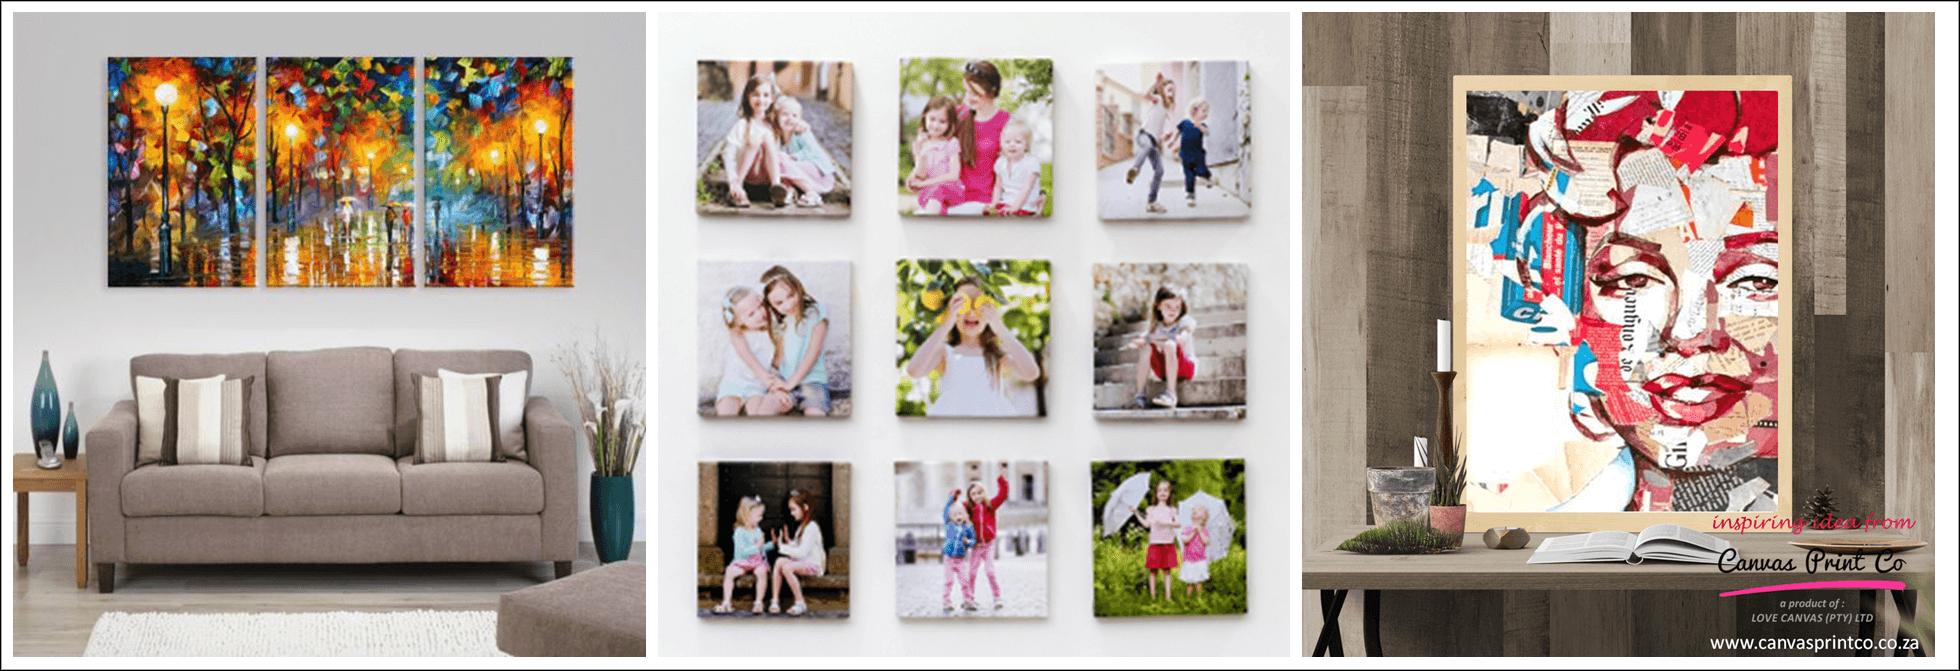 Cheap Canvas Prints from Digital Photos - Canvas Print Co